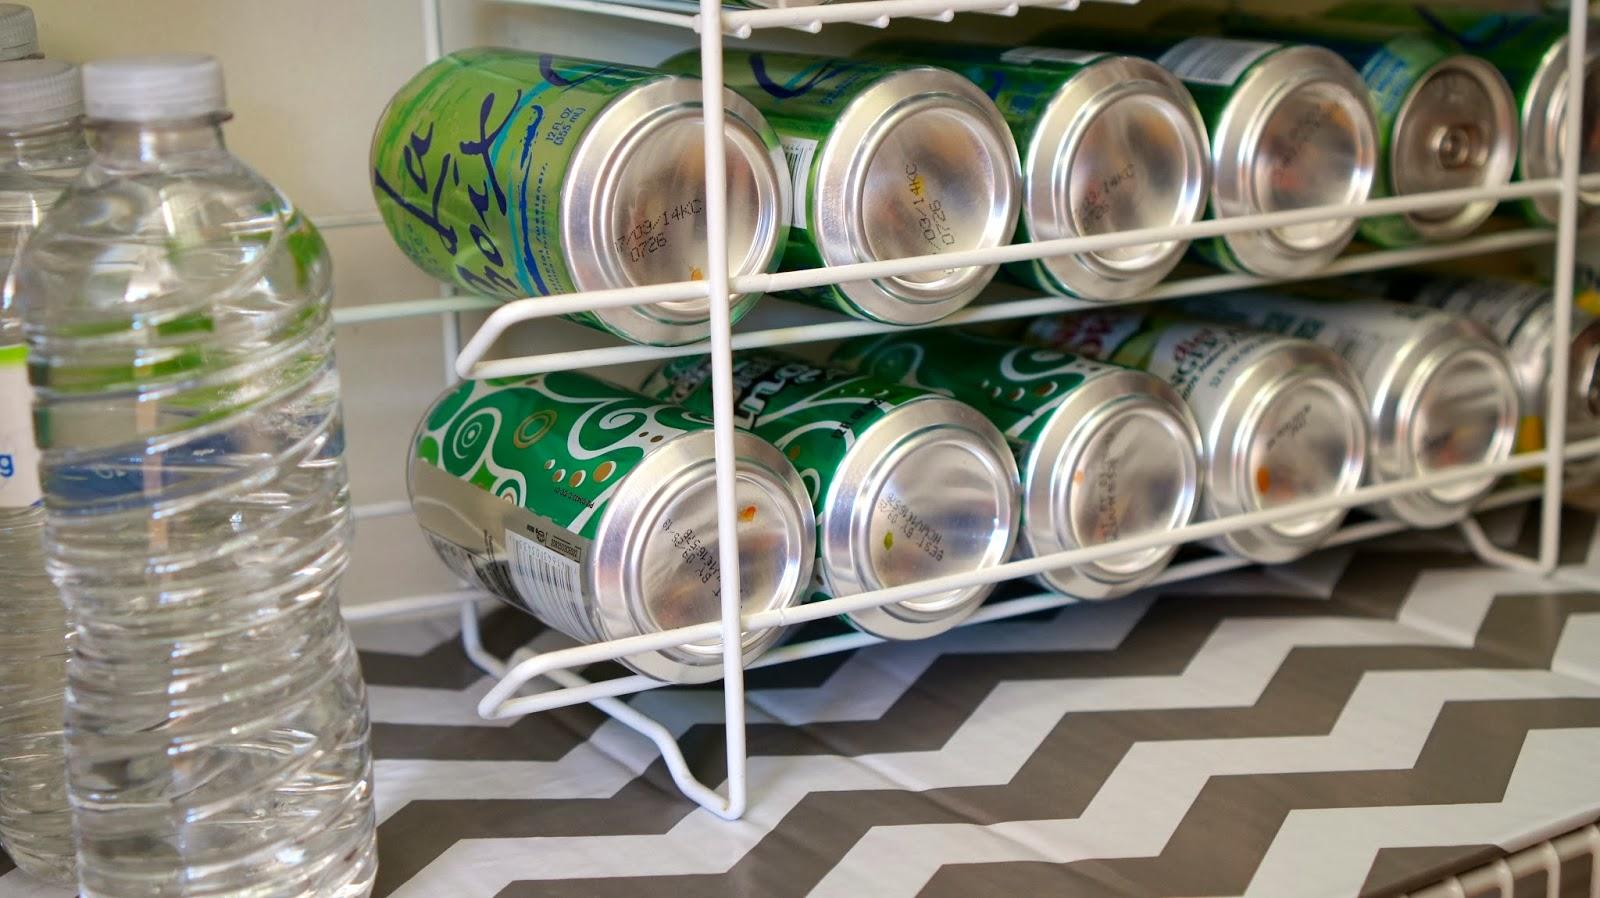 Food Fashion Home Diy Pantry Shelf Liners